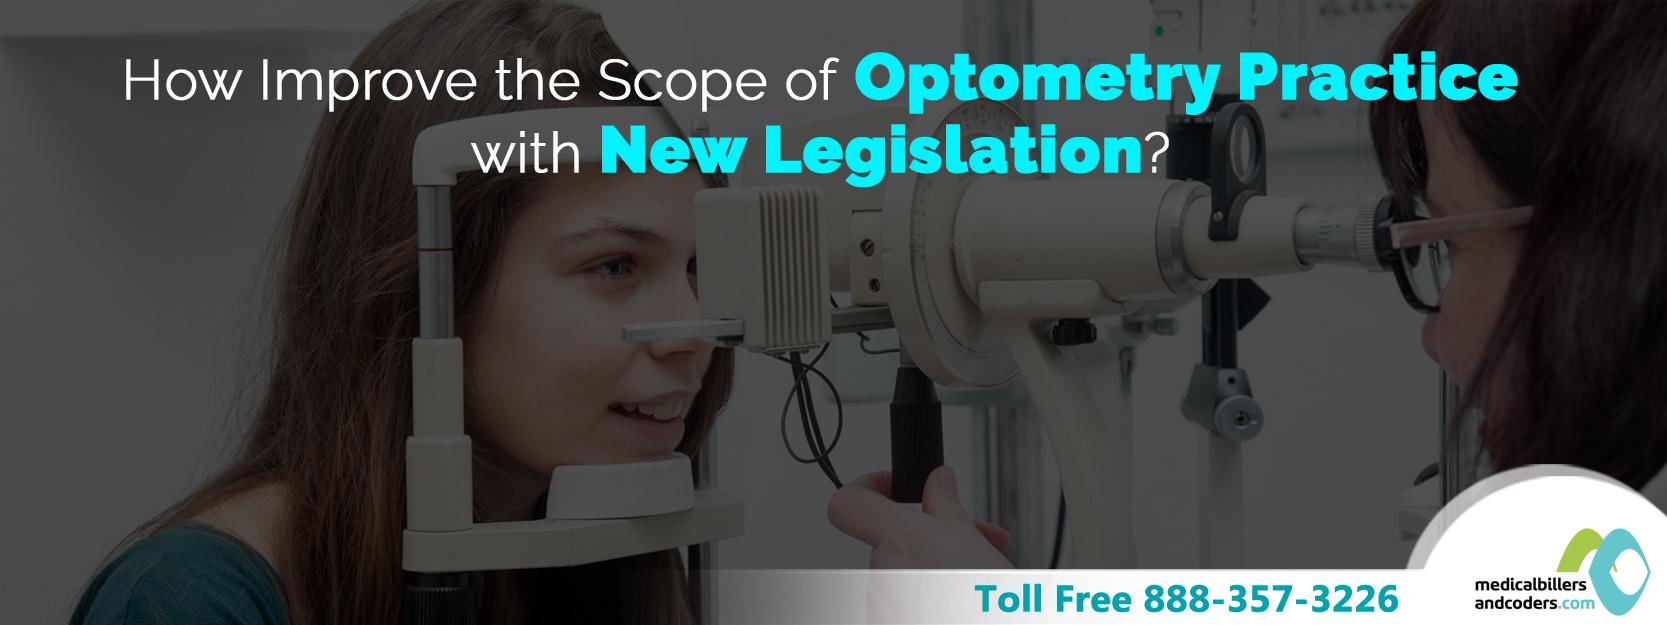 How-improve-the-scope-of-optometry-practice-with-new-legislation-